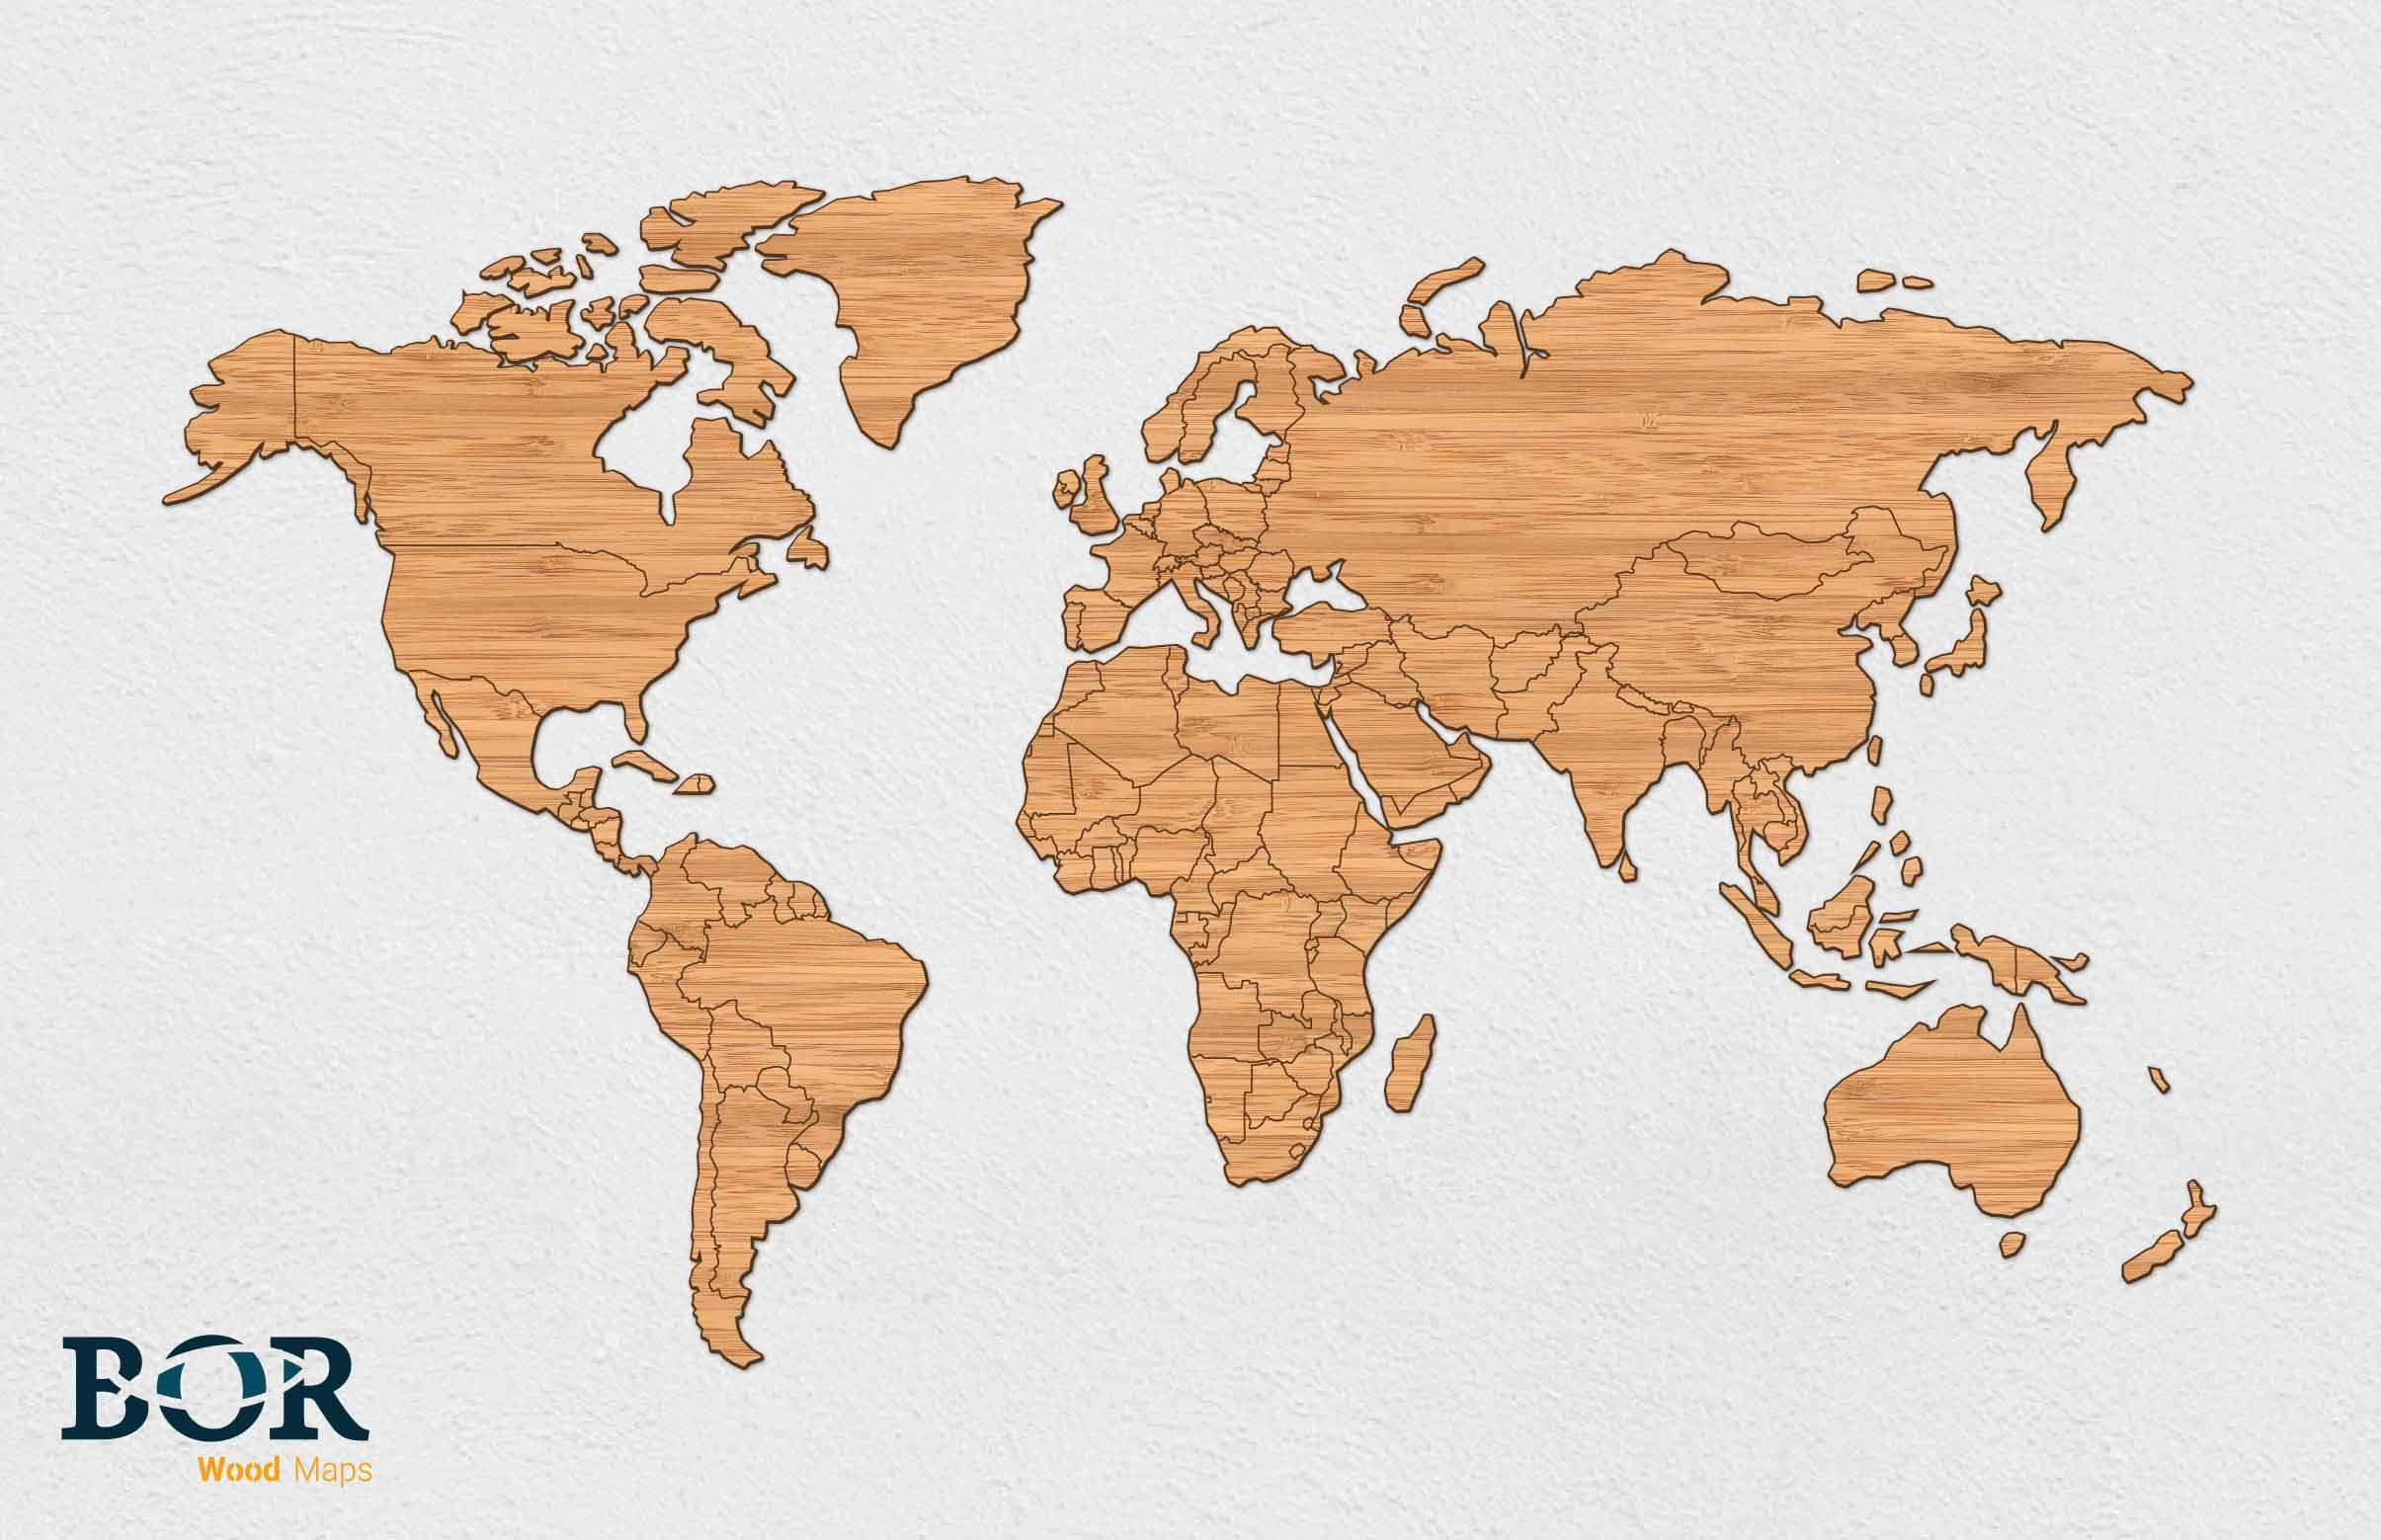 Wereldkaart van hout bamboe bor lasertechniek wereldkaart van hout bamboe altavistaventures Images